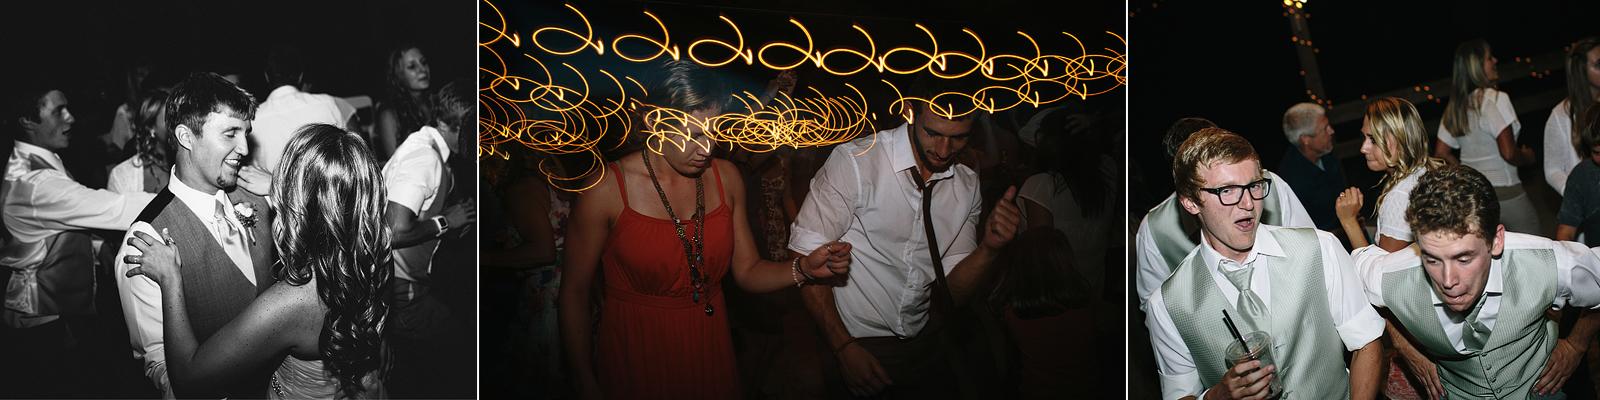 daronjacksonphotography-nelson-150.jpg